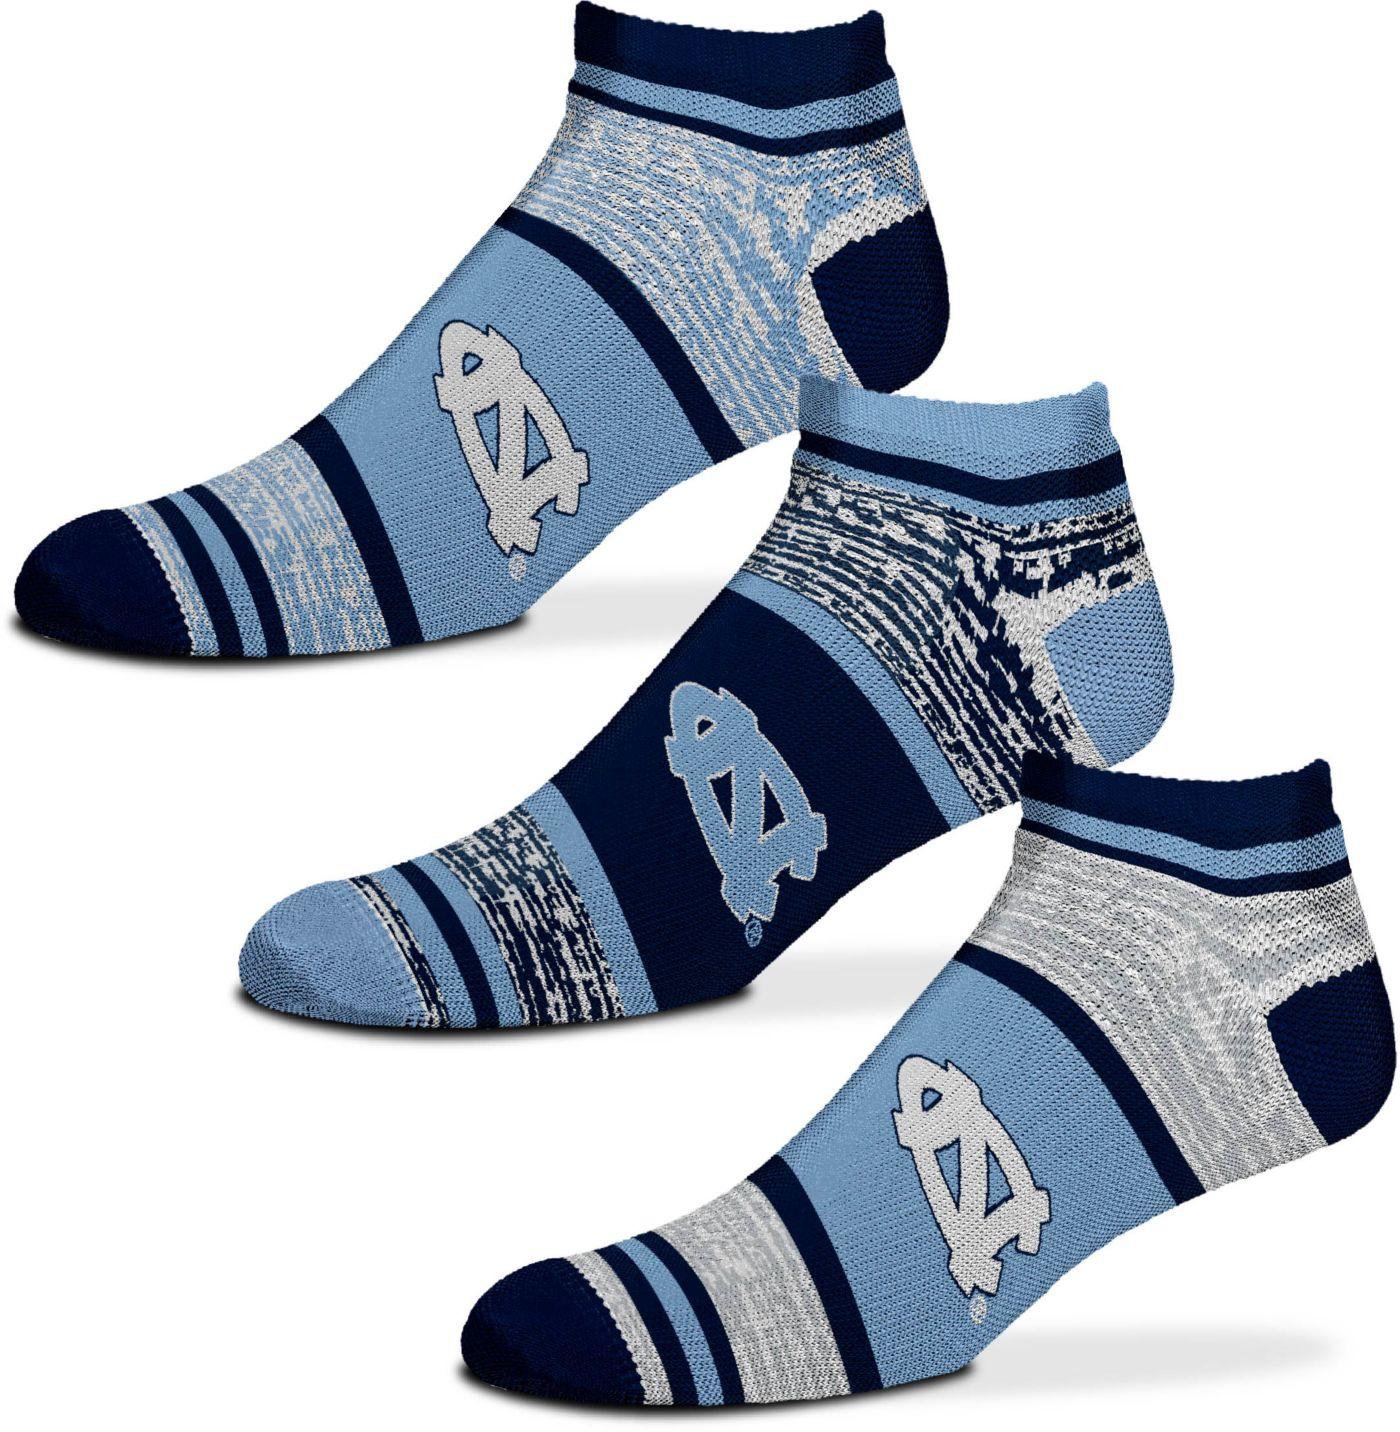 For Bare Feet North Carolina Tar Heels 3 Pack Socks